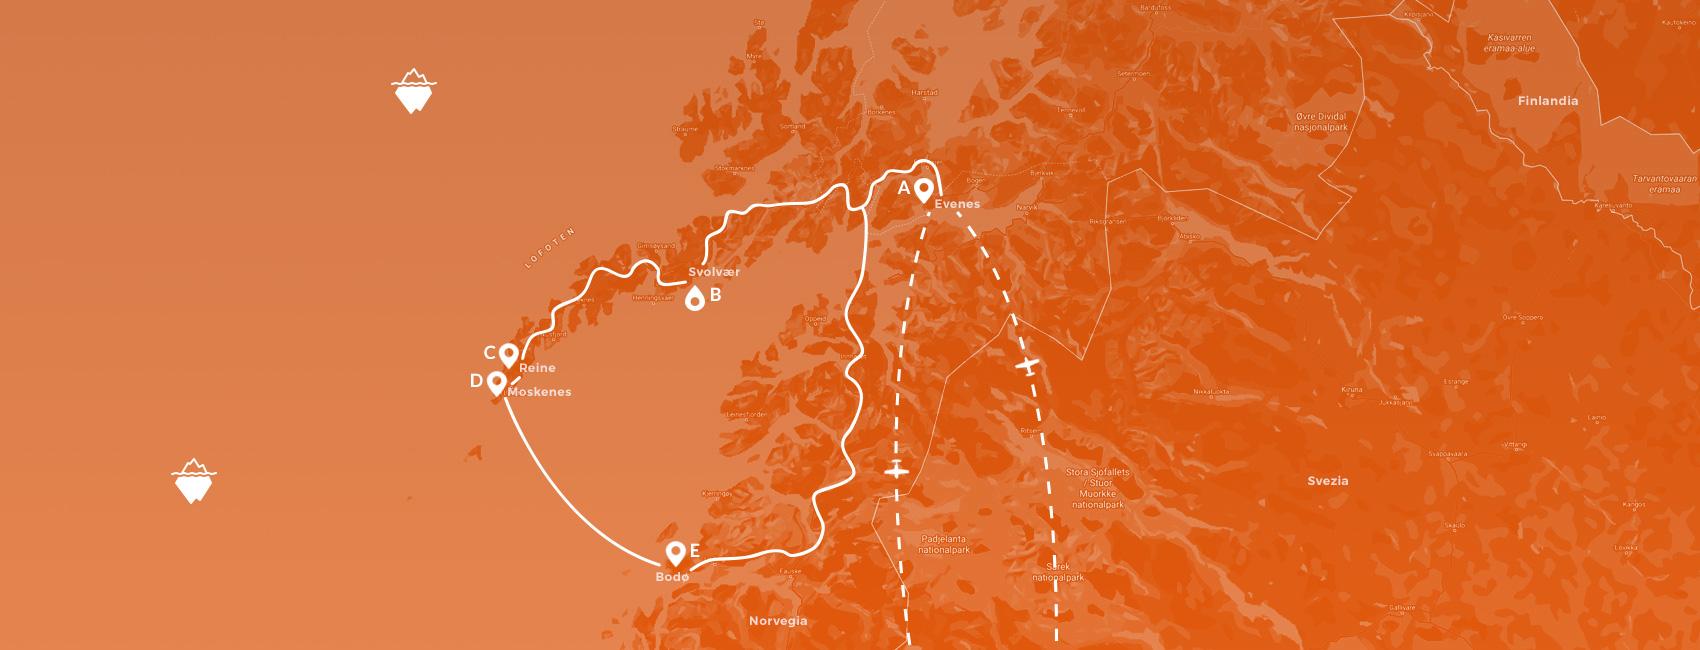 maps norvegia - Lofoten